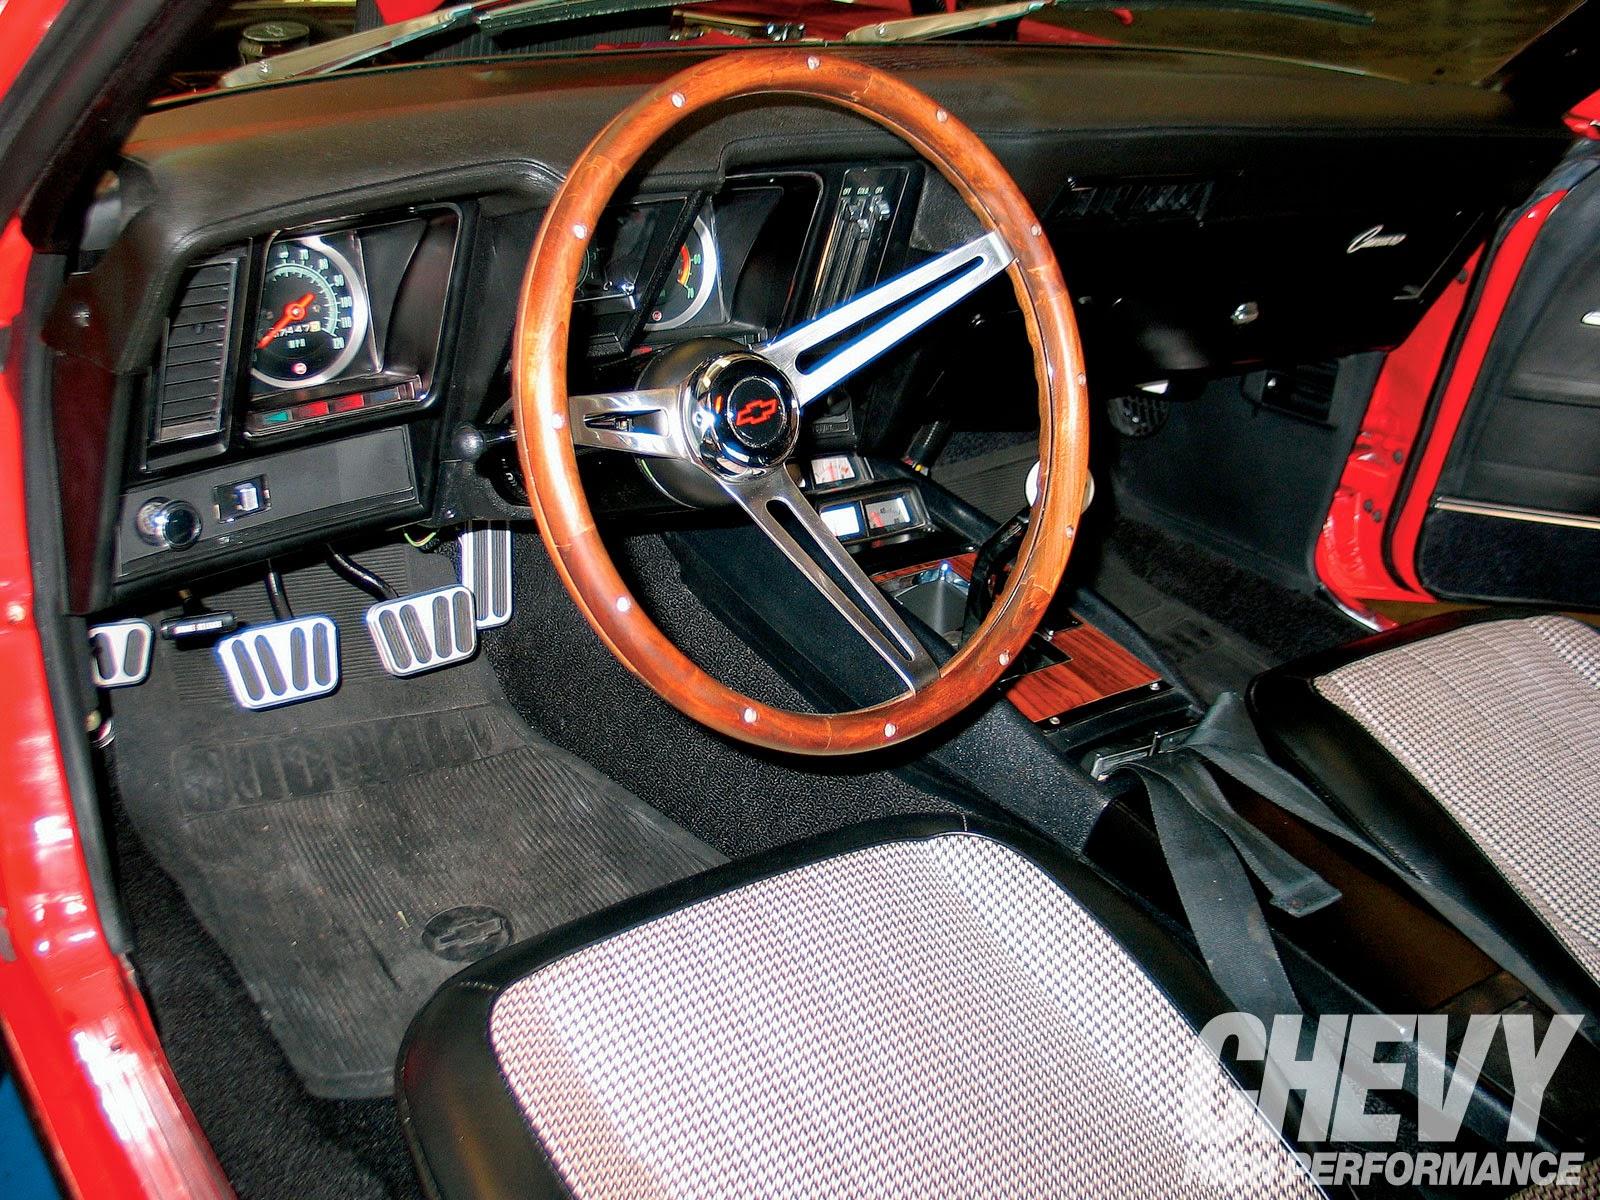 chevrolet camaro 1969 interior. chevrolet camaro 1969 interior n